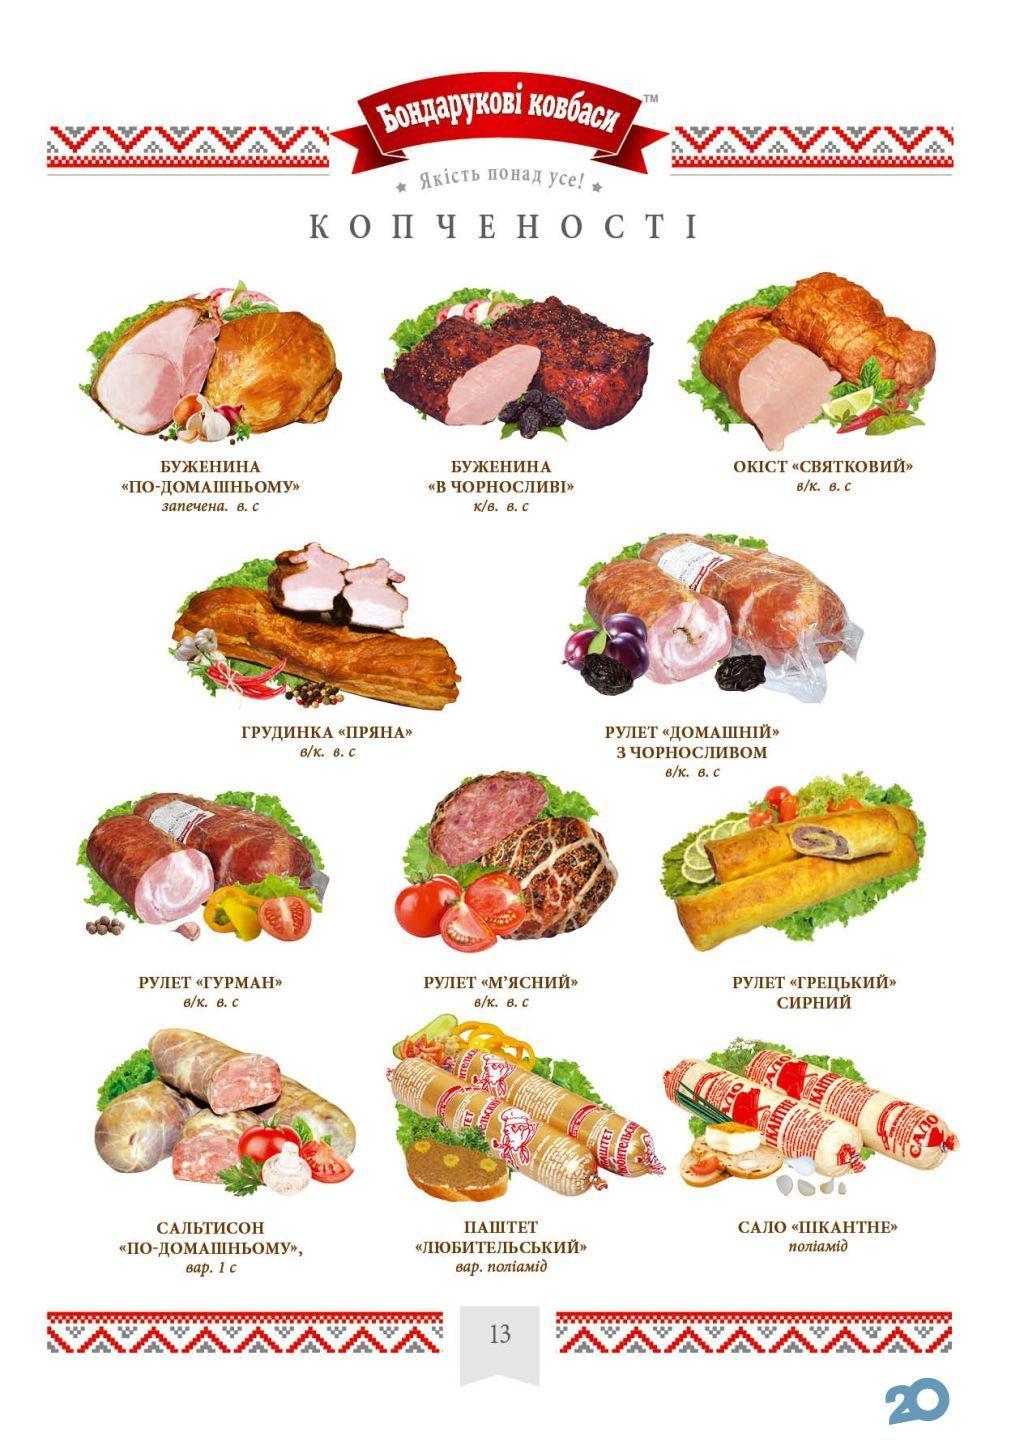 Бондарукові ковбаси, м'ясний магазин - фото 10